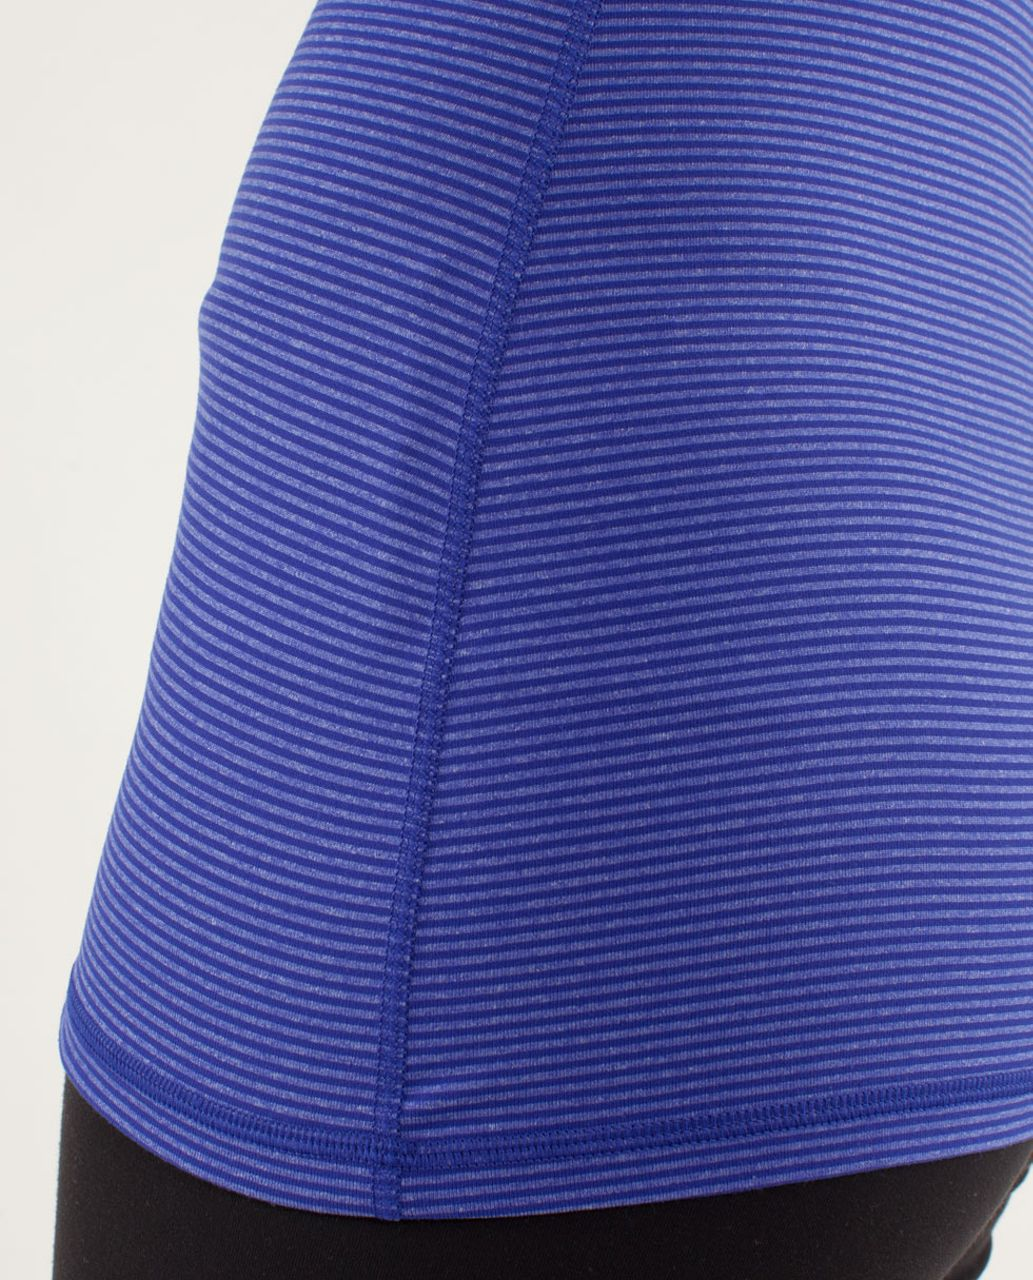 Lululemon Power Y Tank *Luon Light - Tonka Stripe Pigment Blue / Heathered Pigment Blue